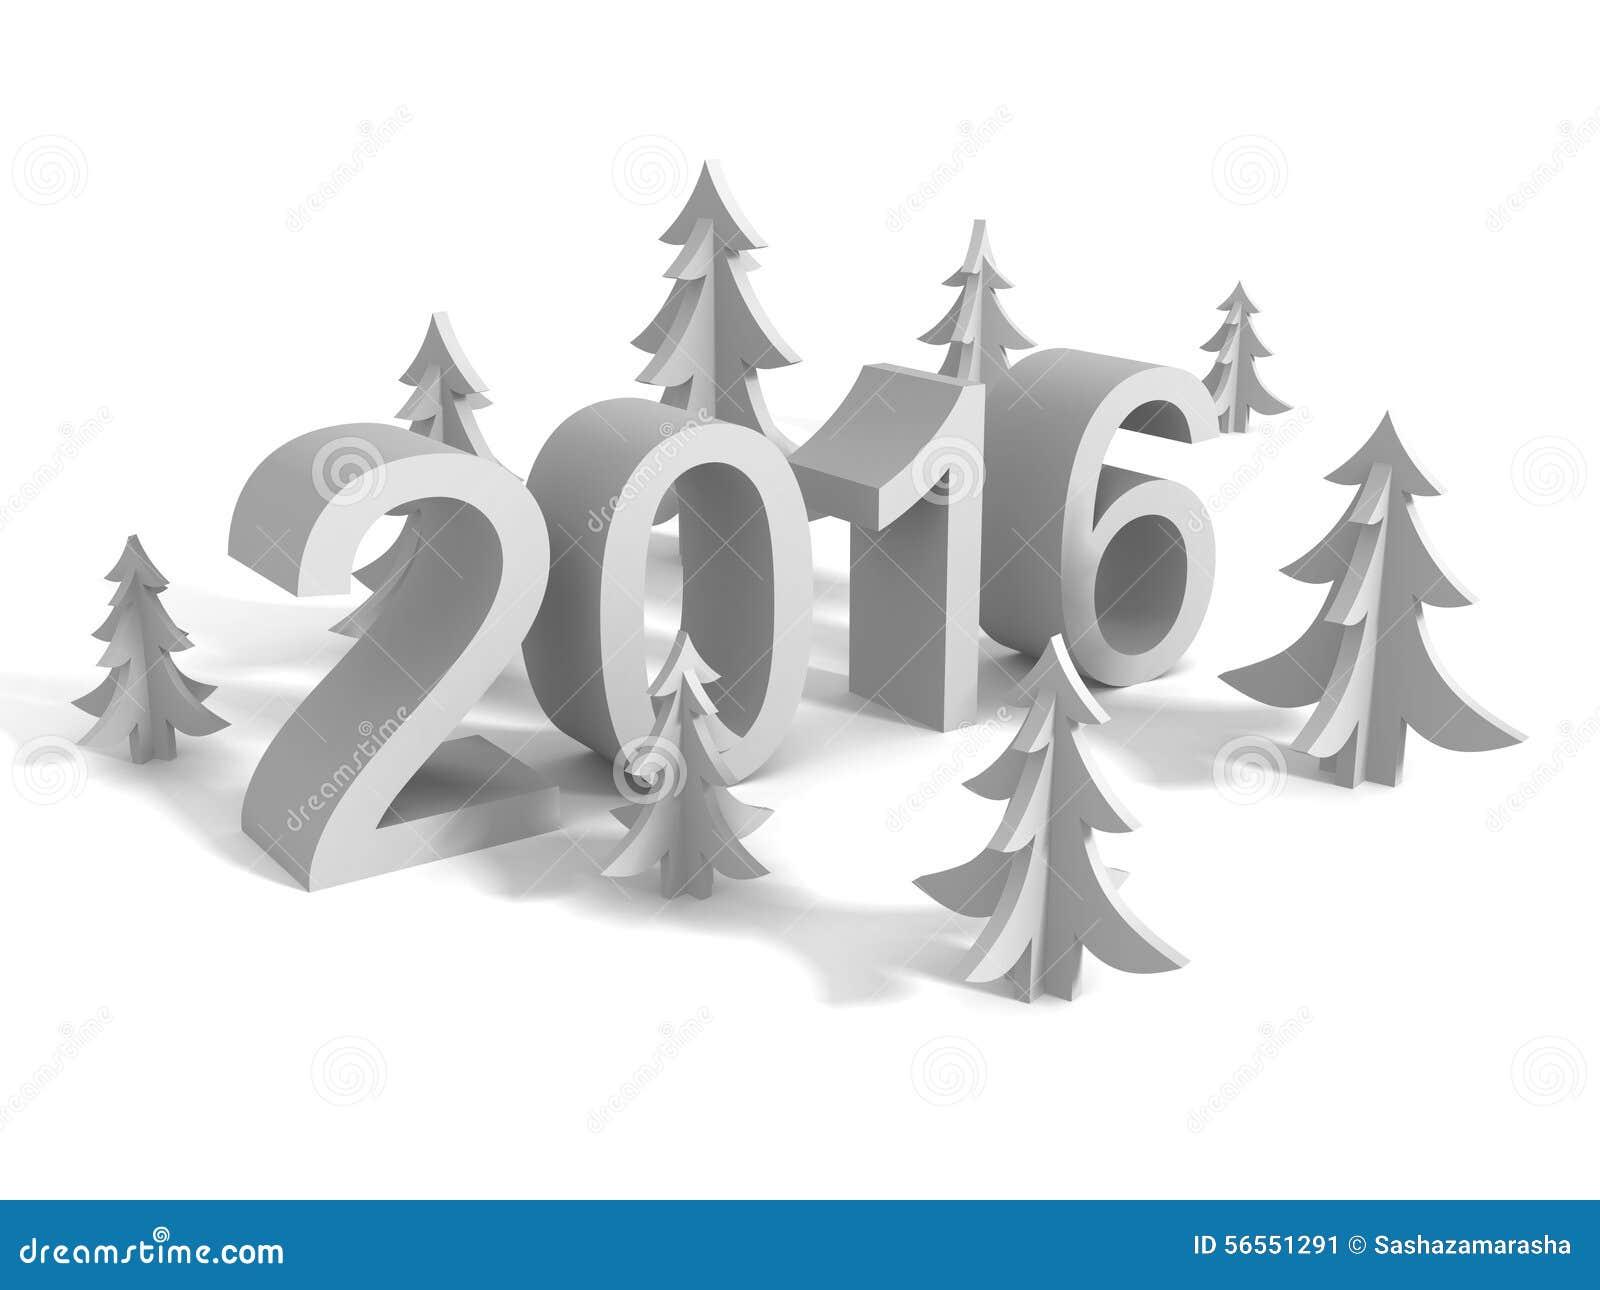 Download Νέο σημάδι έτους 2016 με τα χριστουγεννιάτικα δέντρα Απεικόνιση αποθεμάτων - εικονογραφία από αστέρι, κάρτα: 56551291